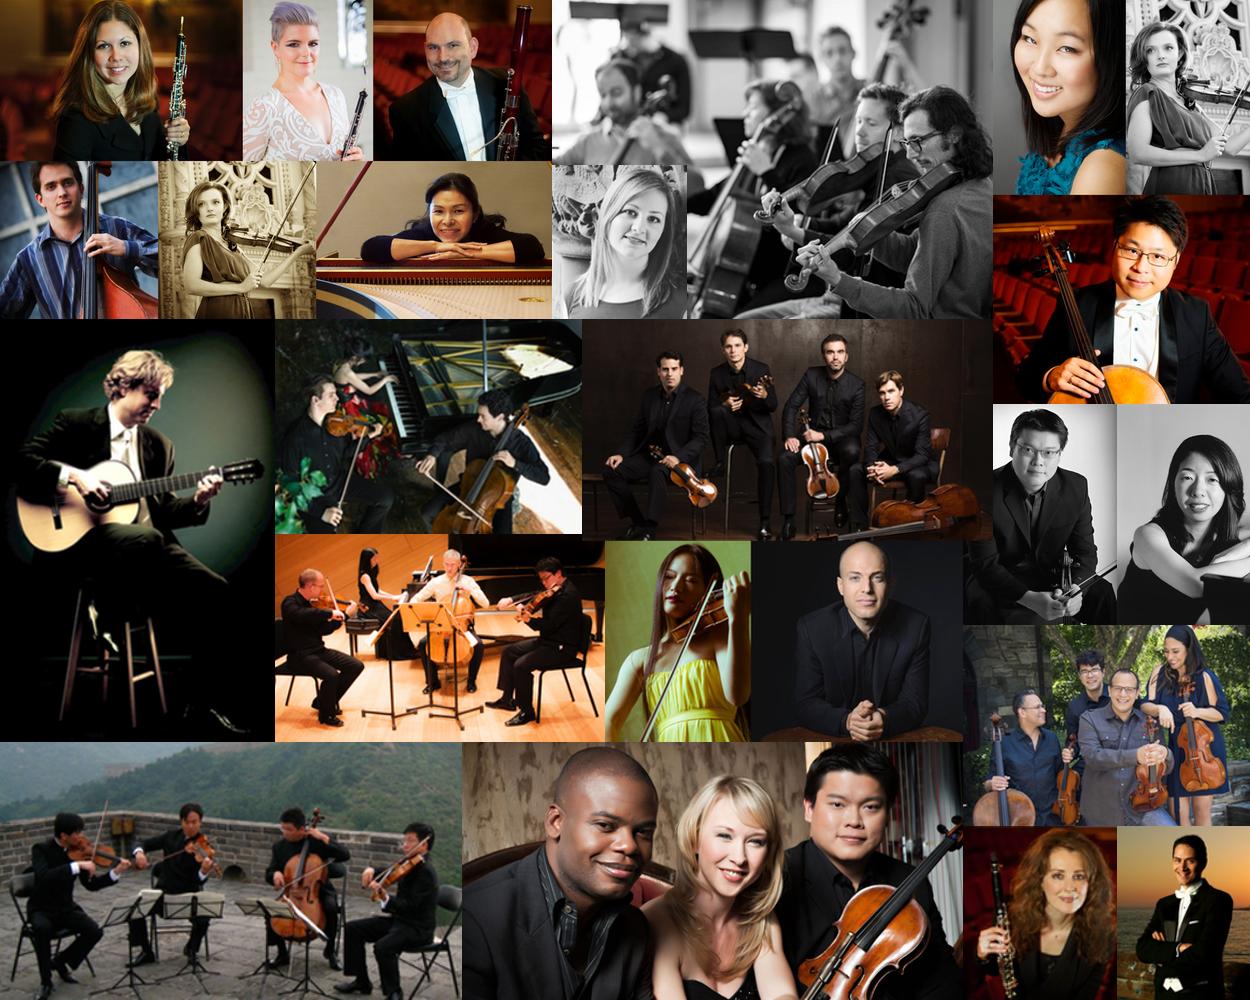 2019-20 ECHO Chamber Music Series Season